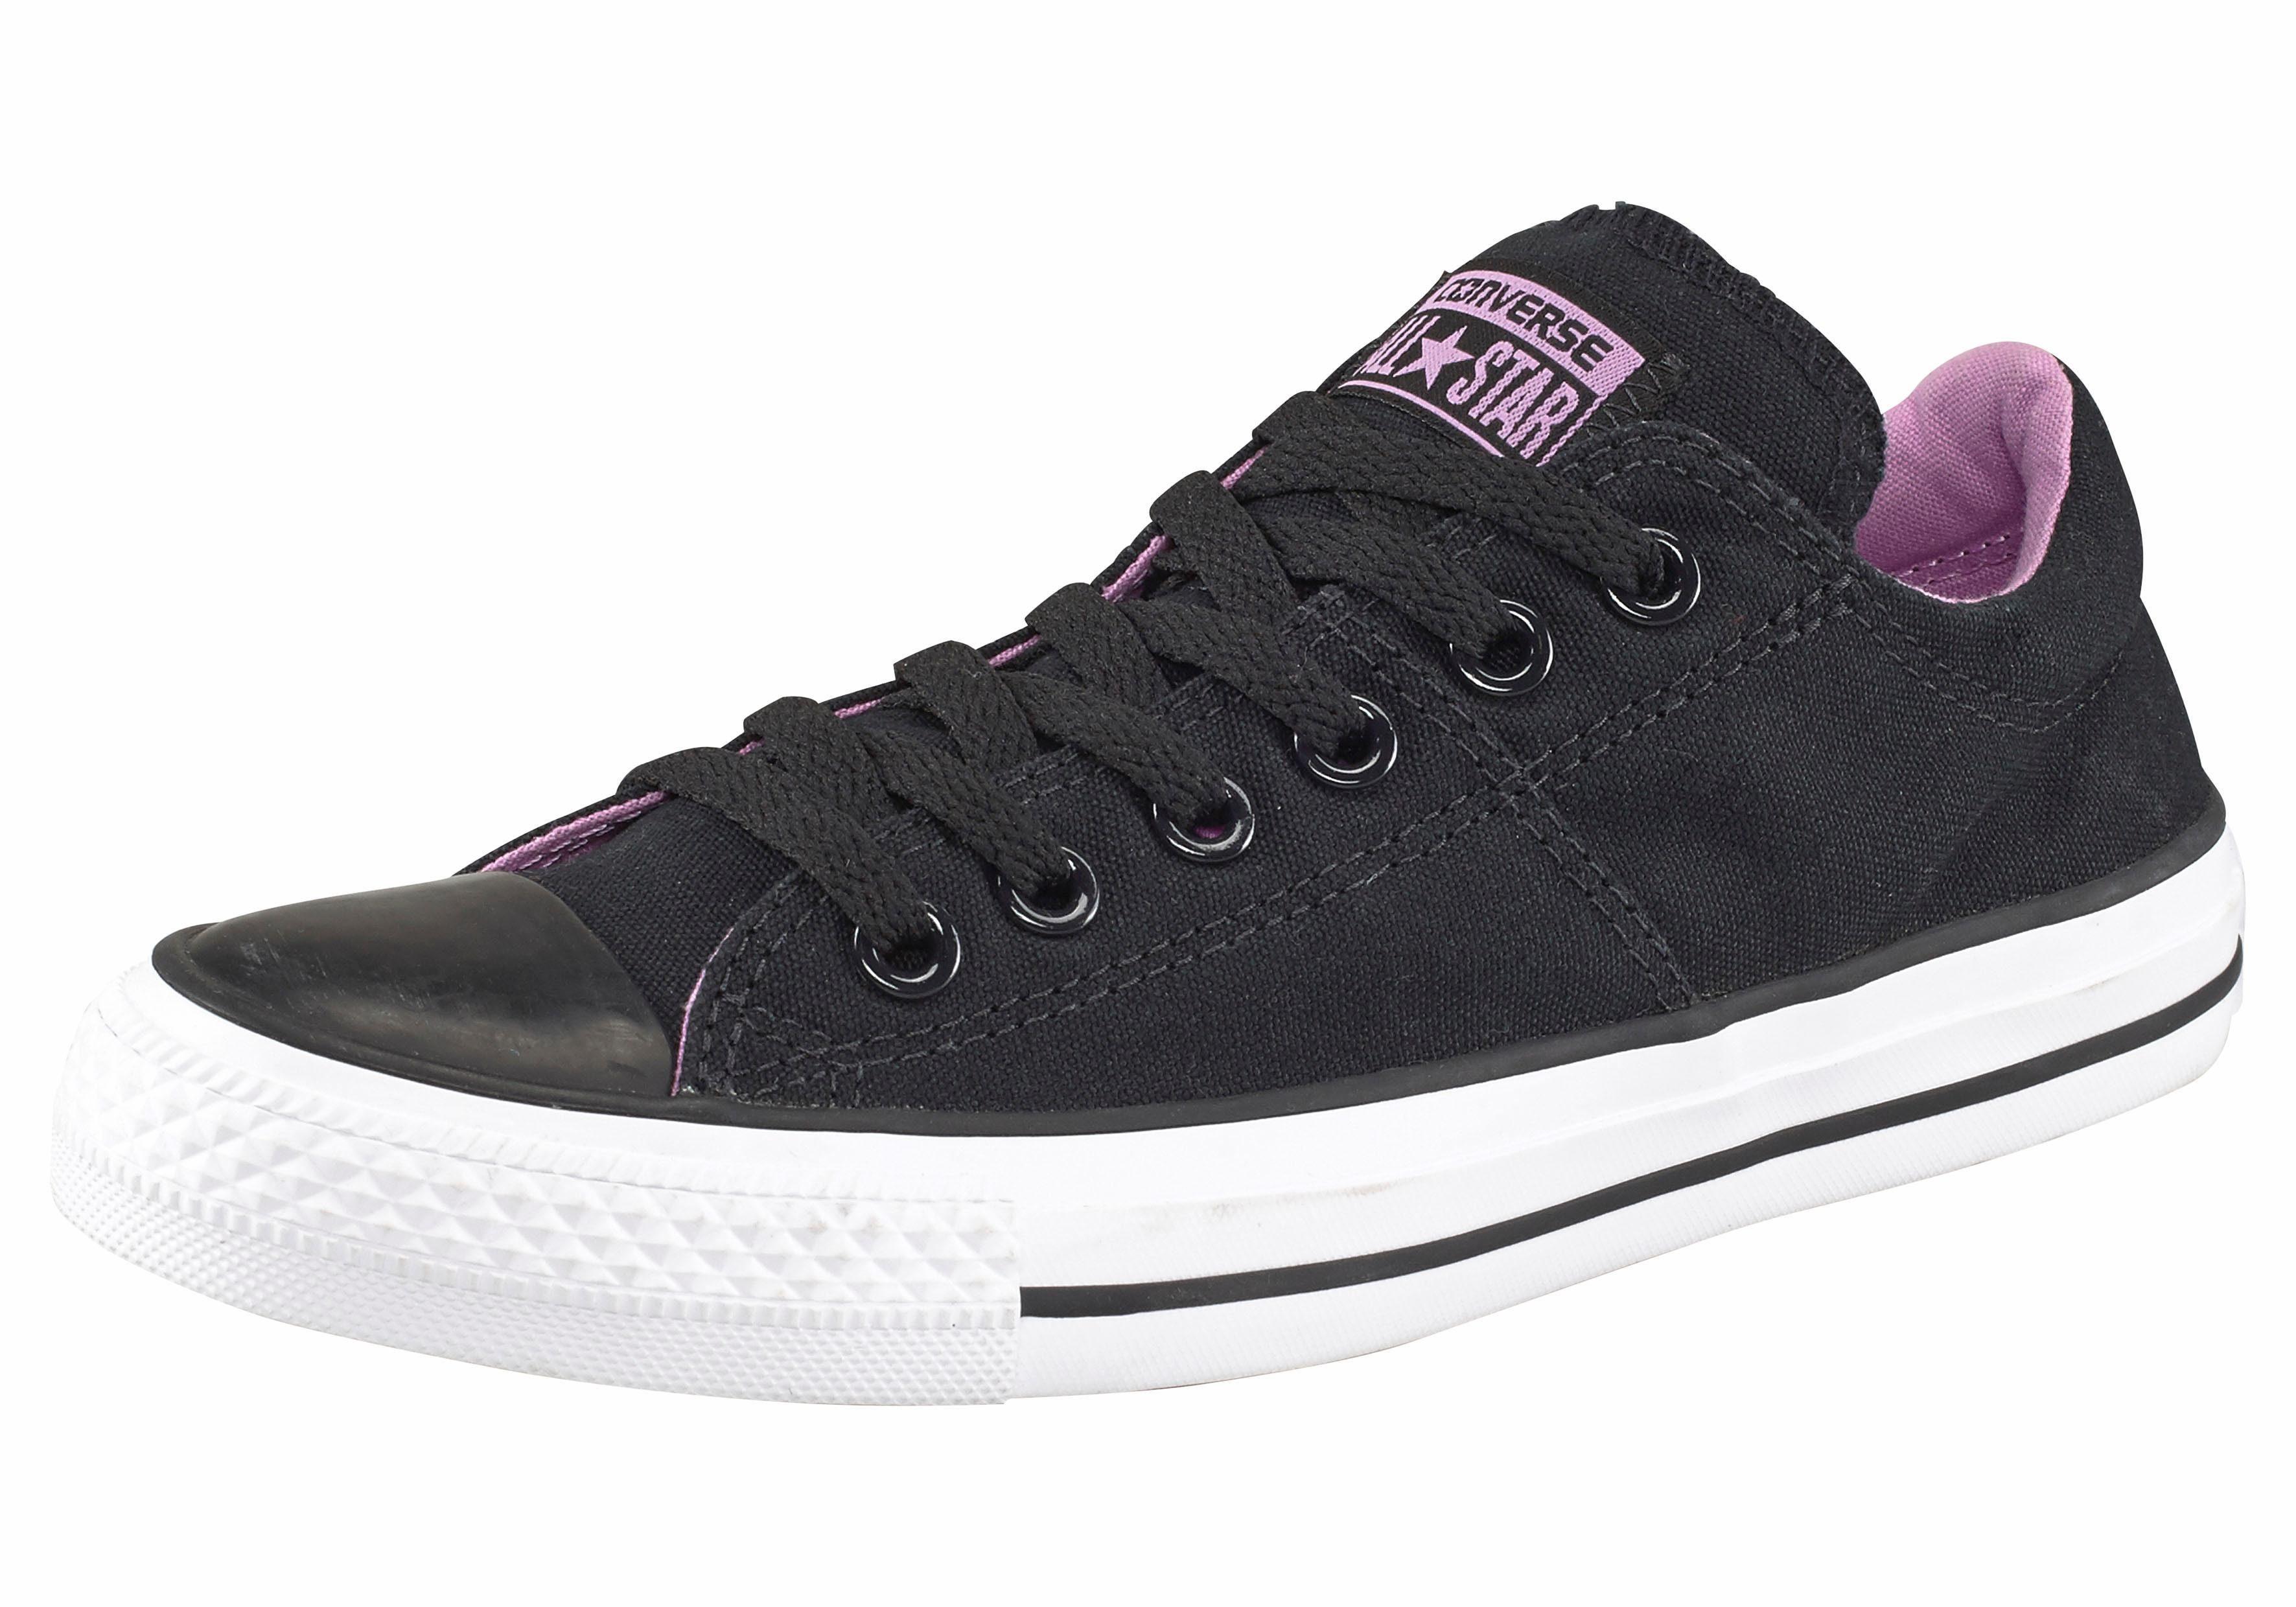 Converse Chuck Taylor Madison Ox Sneaker kaufen  schwarz-lila